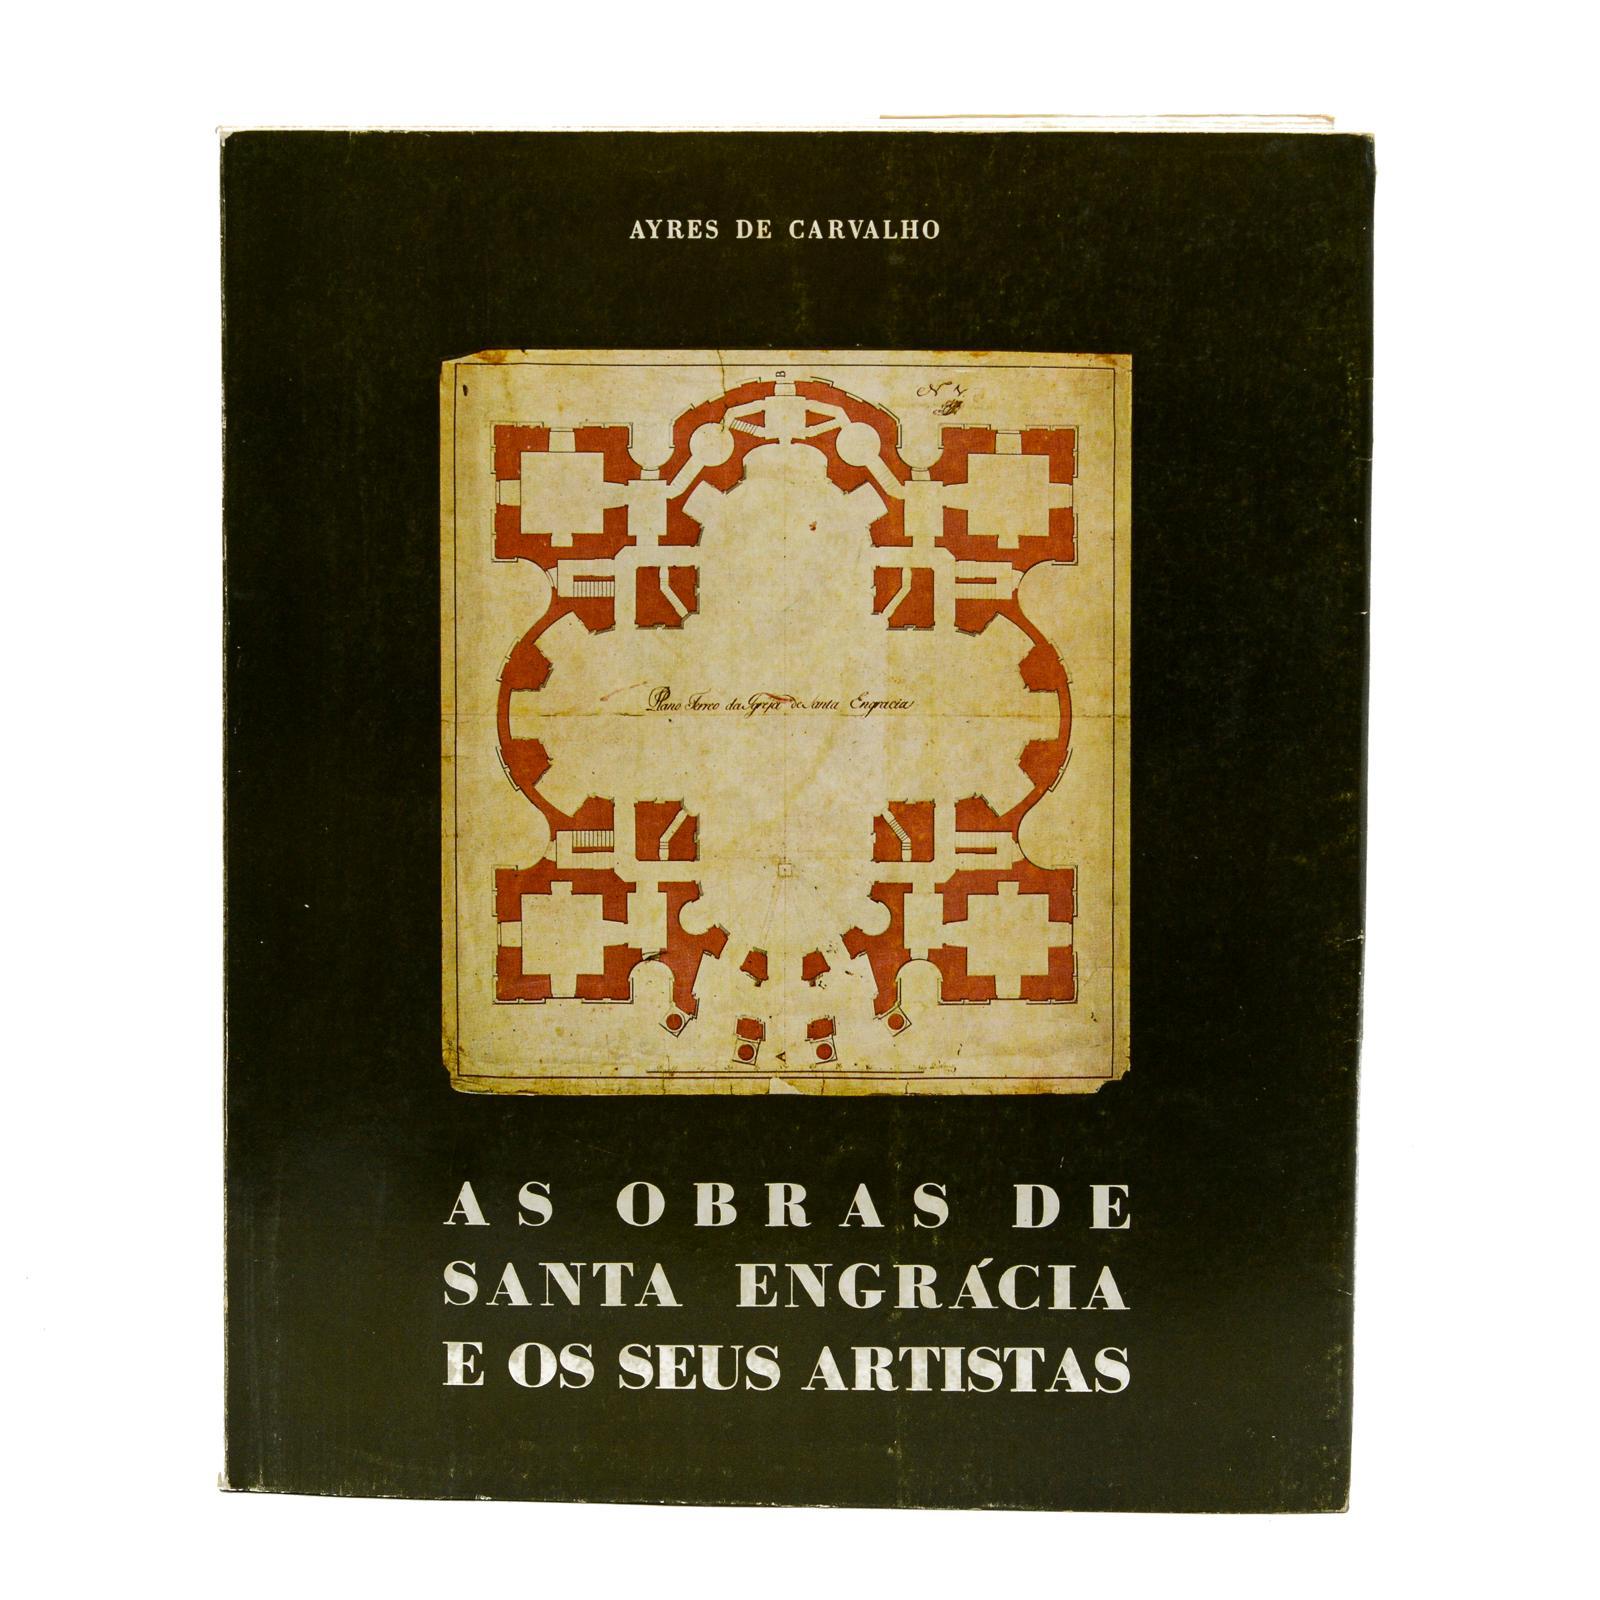 CARVALHO. AS OBRAS DE SANTA ENGRÁCIA...1 vol. br.